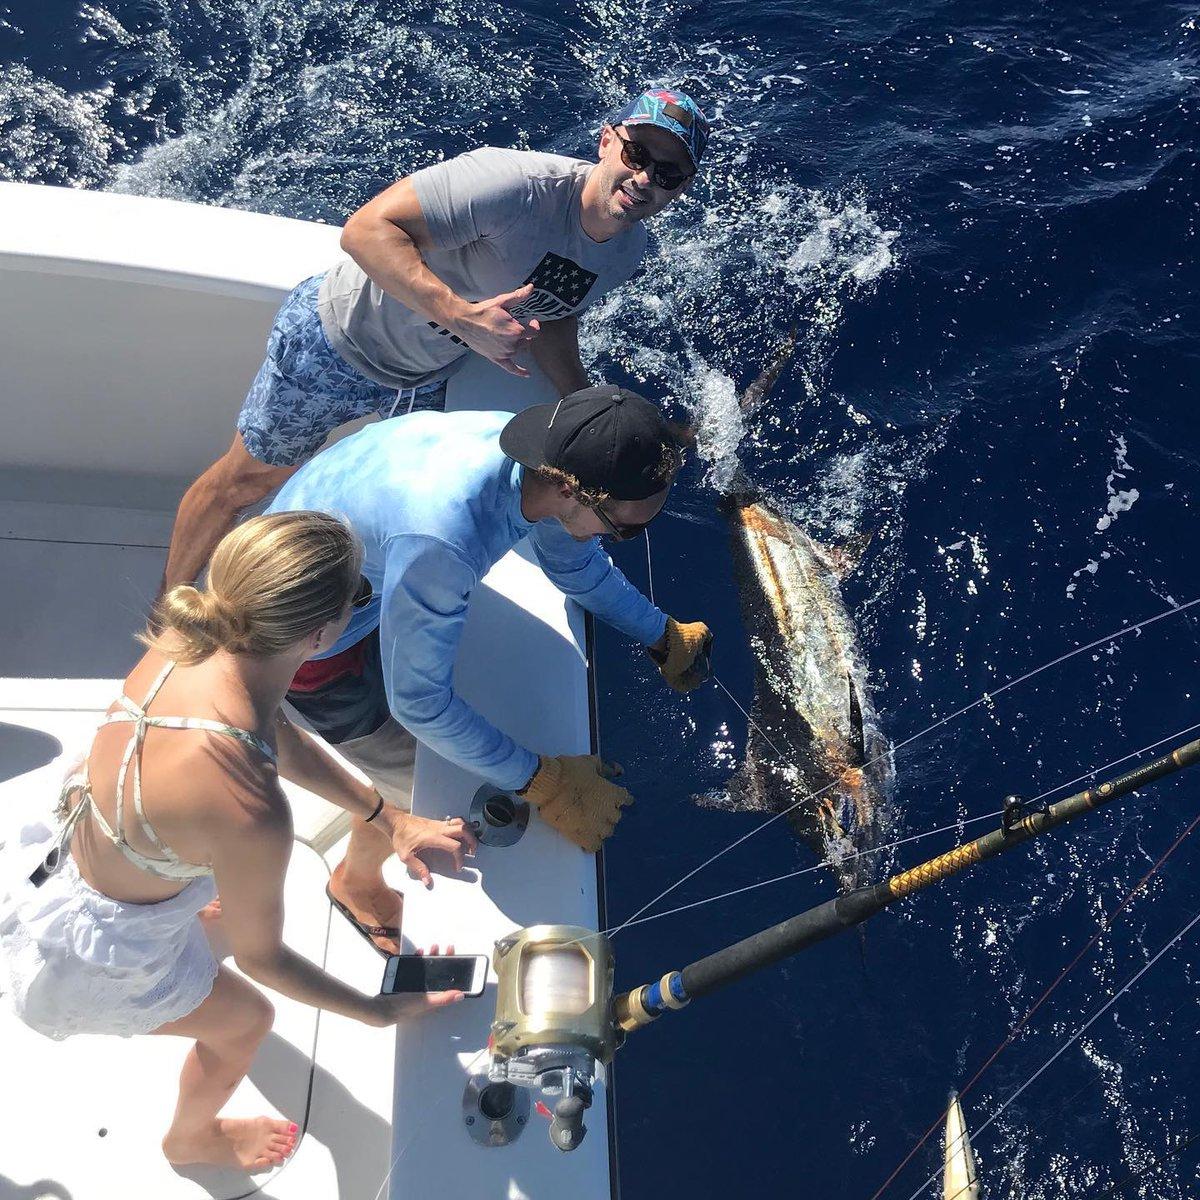 Kona, HI - Hooked Up went 1-3 on Blue Marlin.